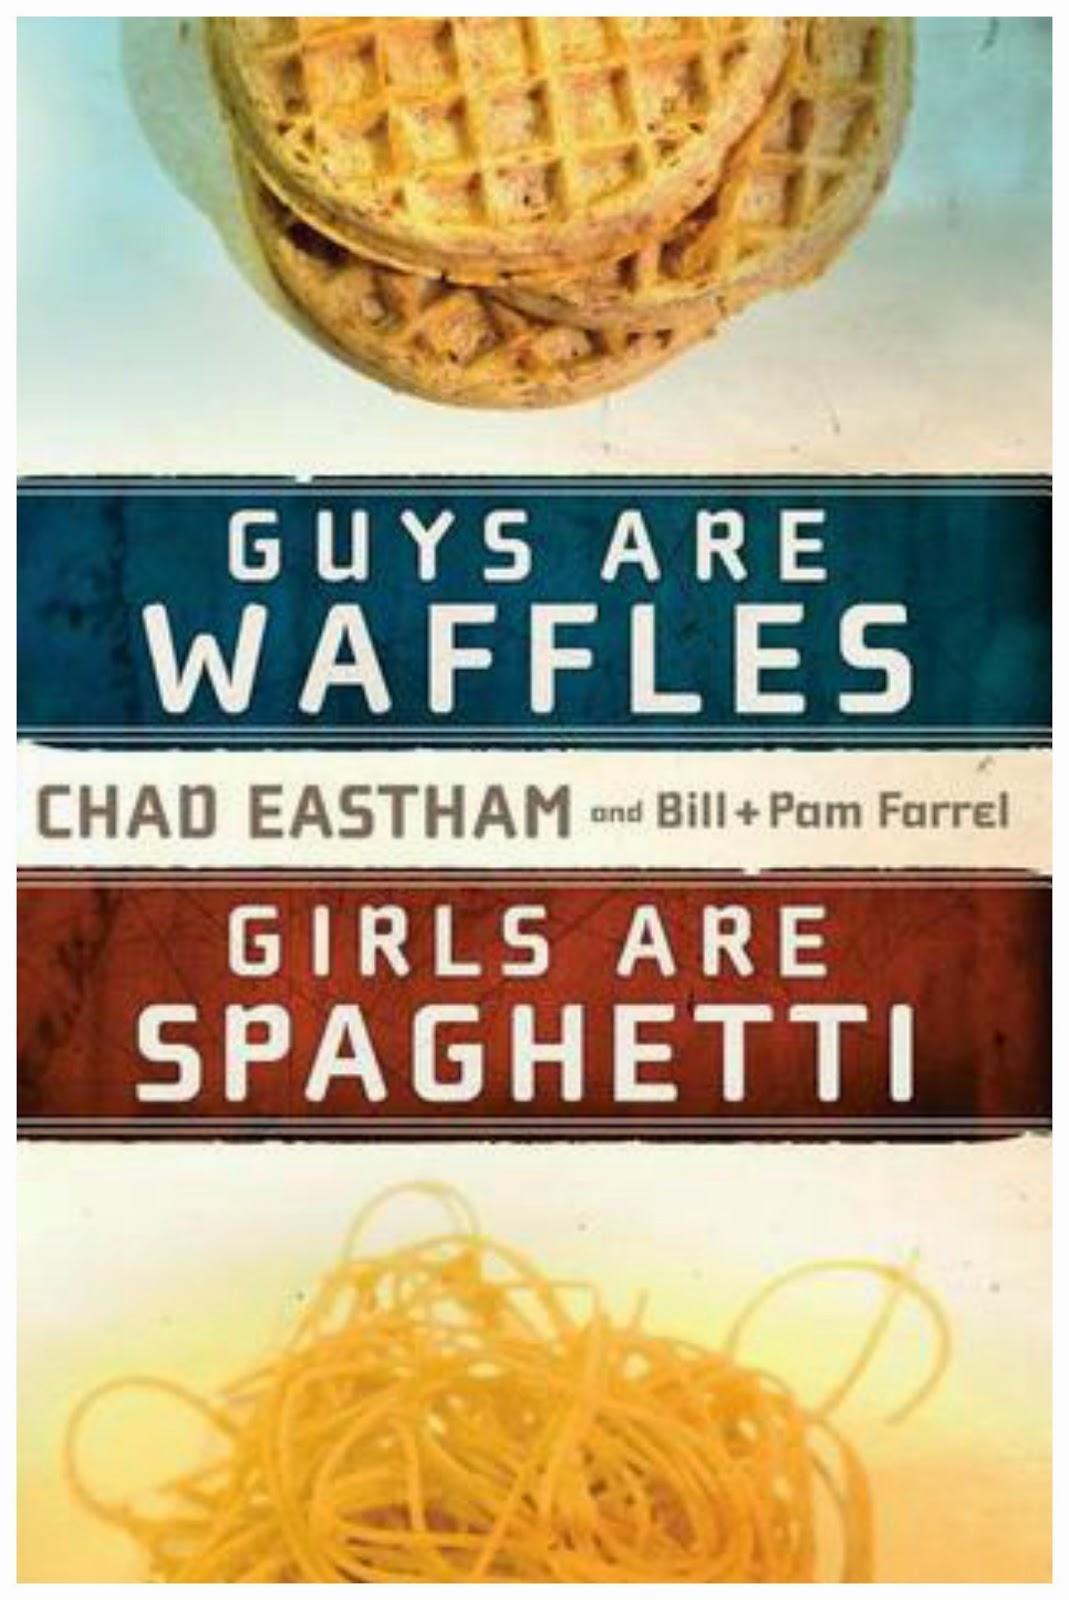 Chad Eastham